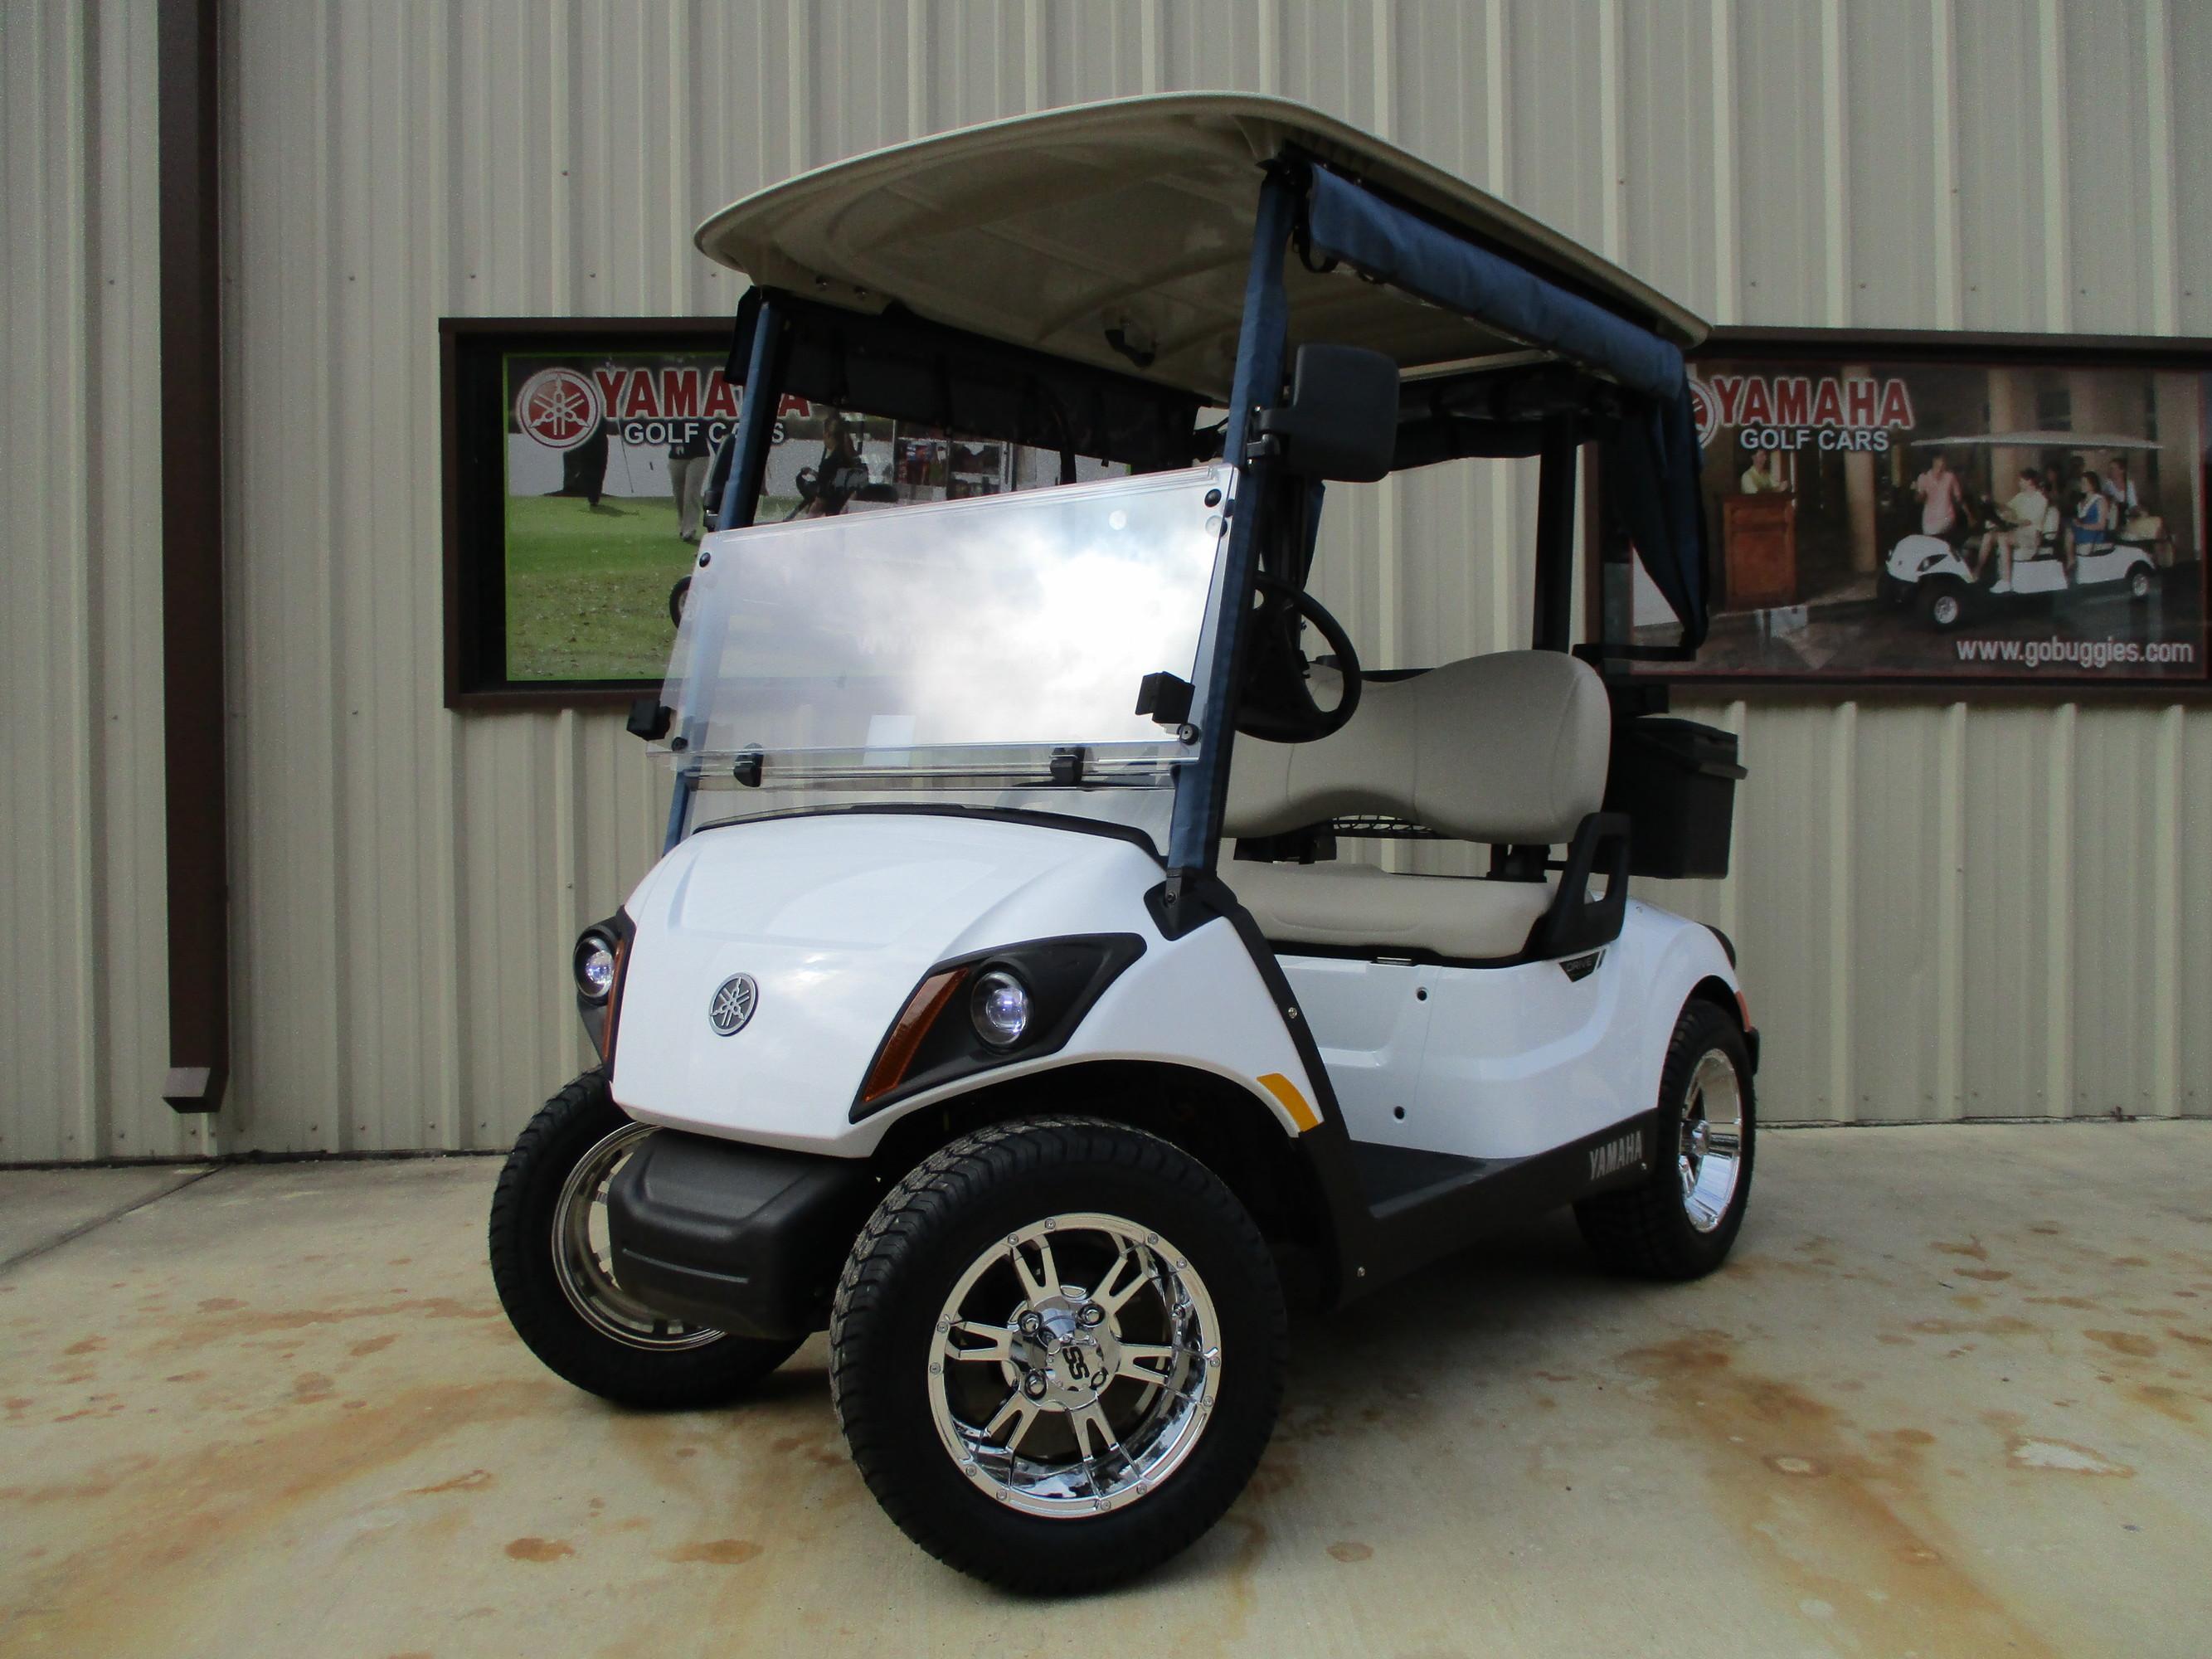 Custom Golfing Cars   Action Buggies   Willis Texas on custom pinstriping by hot dog, custom pinstriping stencils, custom truck pinstriping,